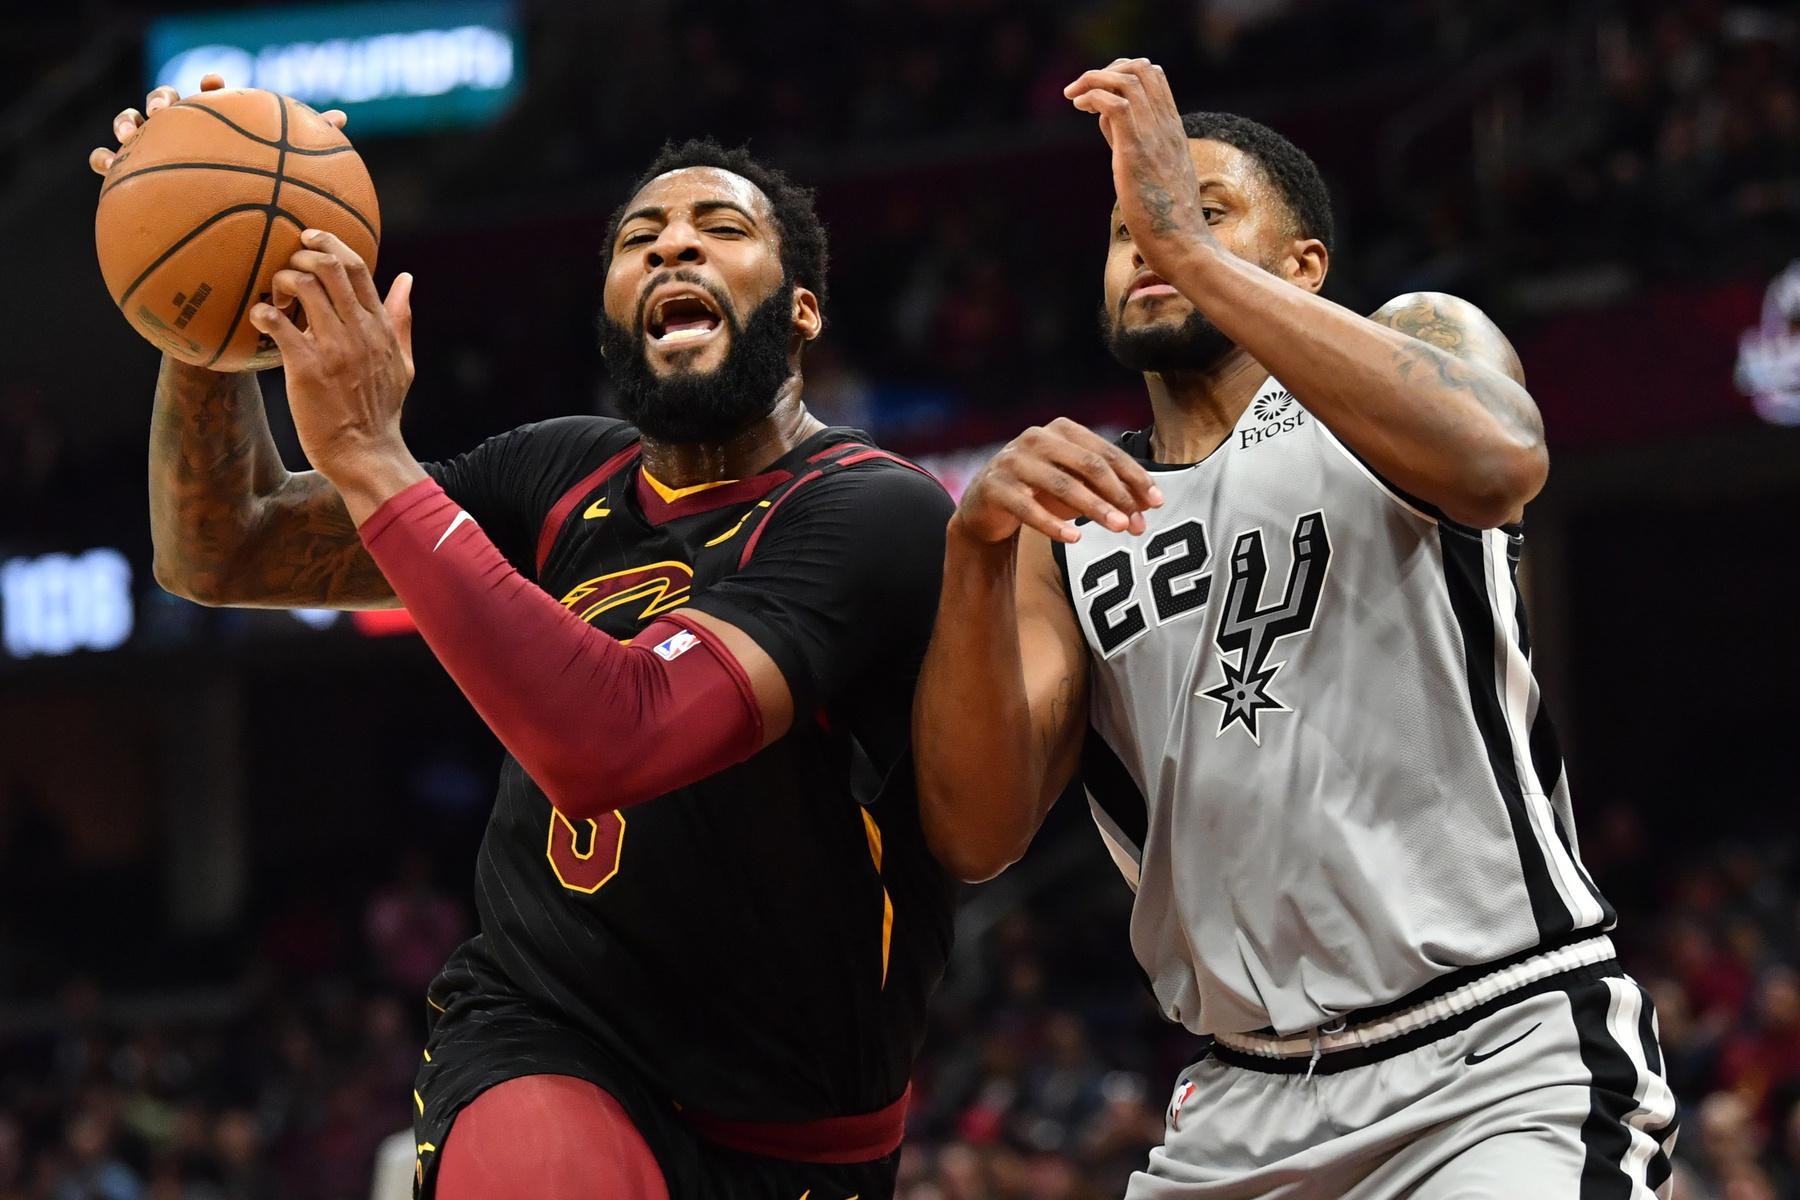 Andre Drummond will return to Cavaliers next season